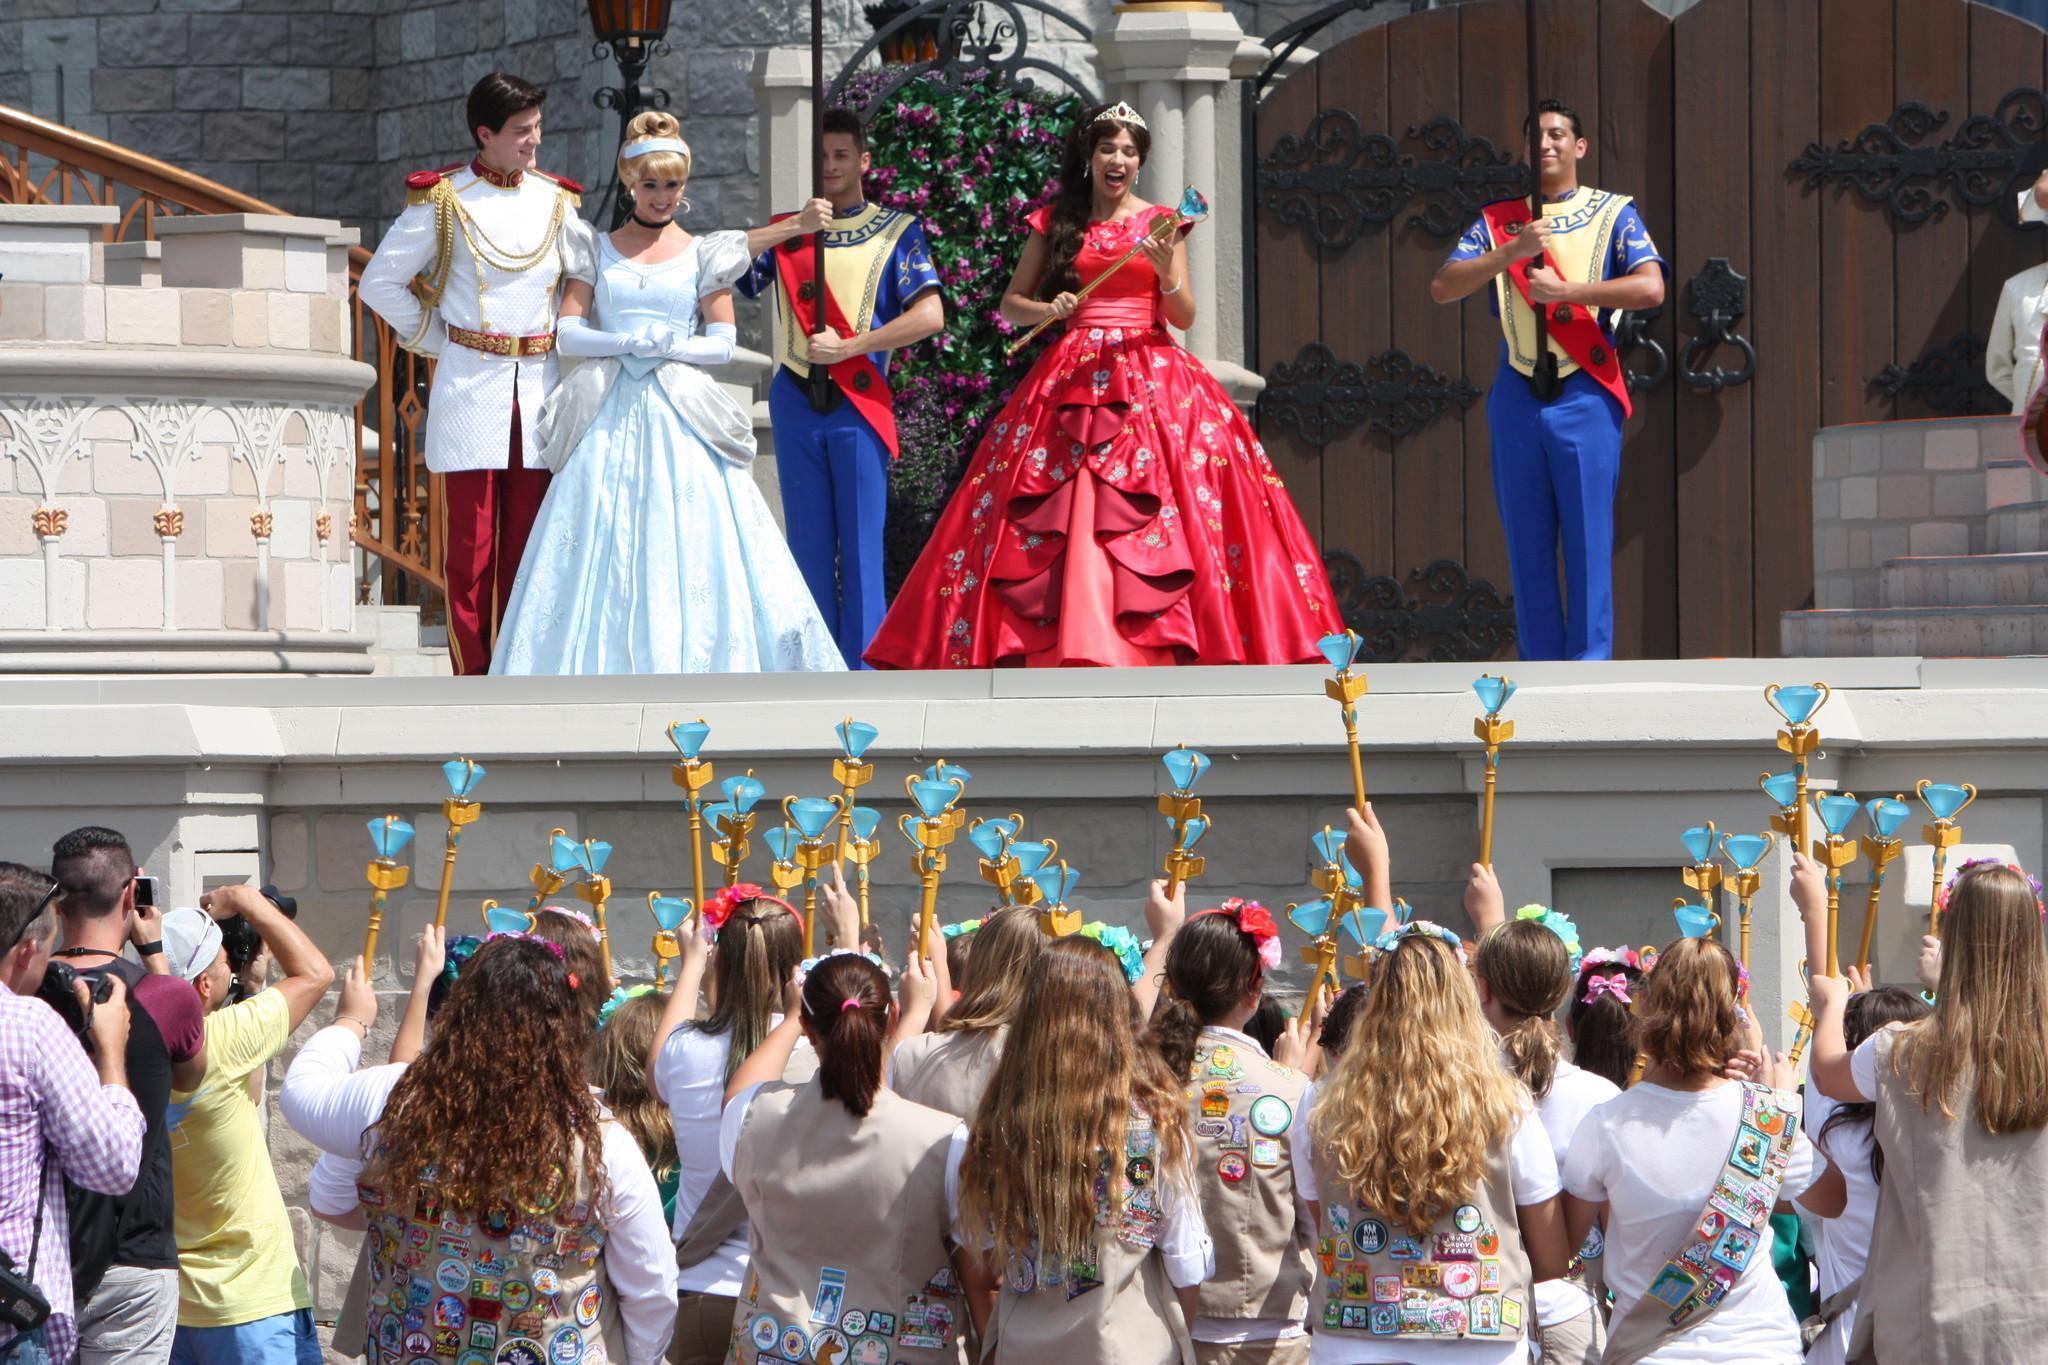 79ebbd2b881 Princess Elena of Avalor finds home at Disney s Magic Kingdom - Orlando  Sentinel